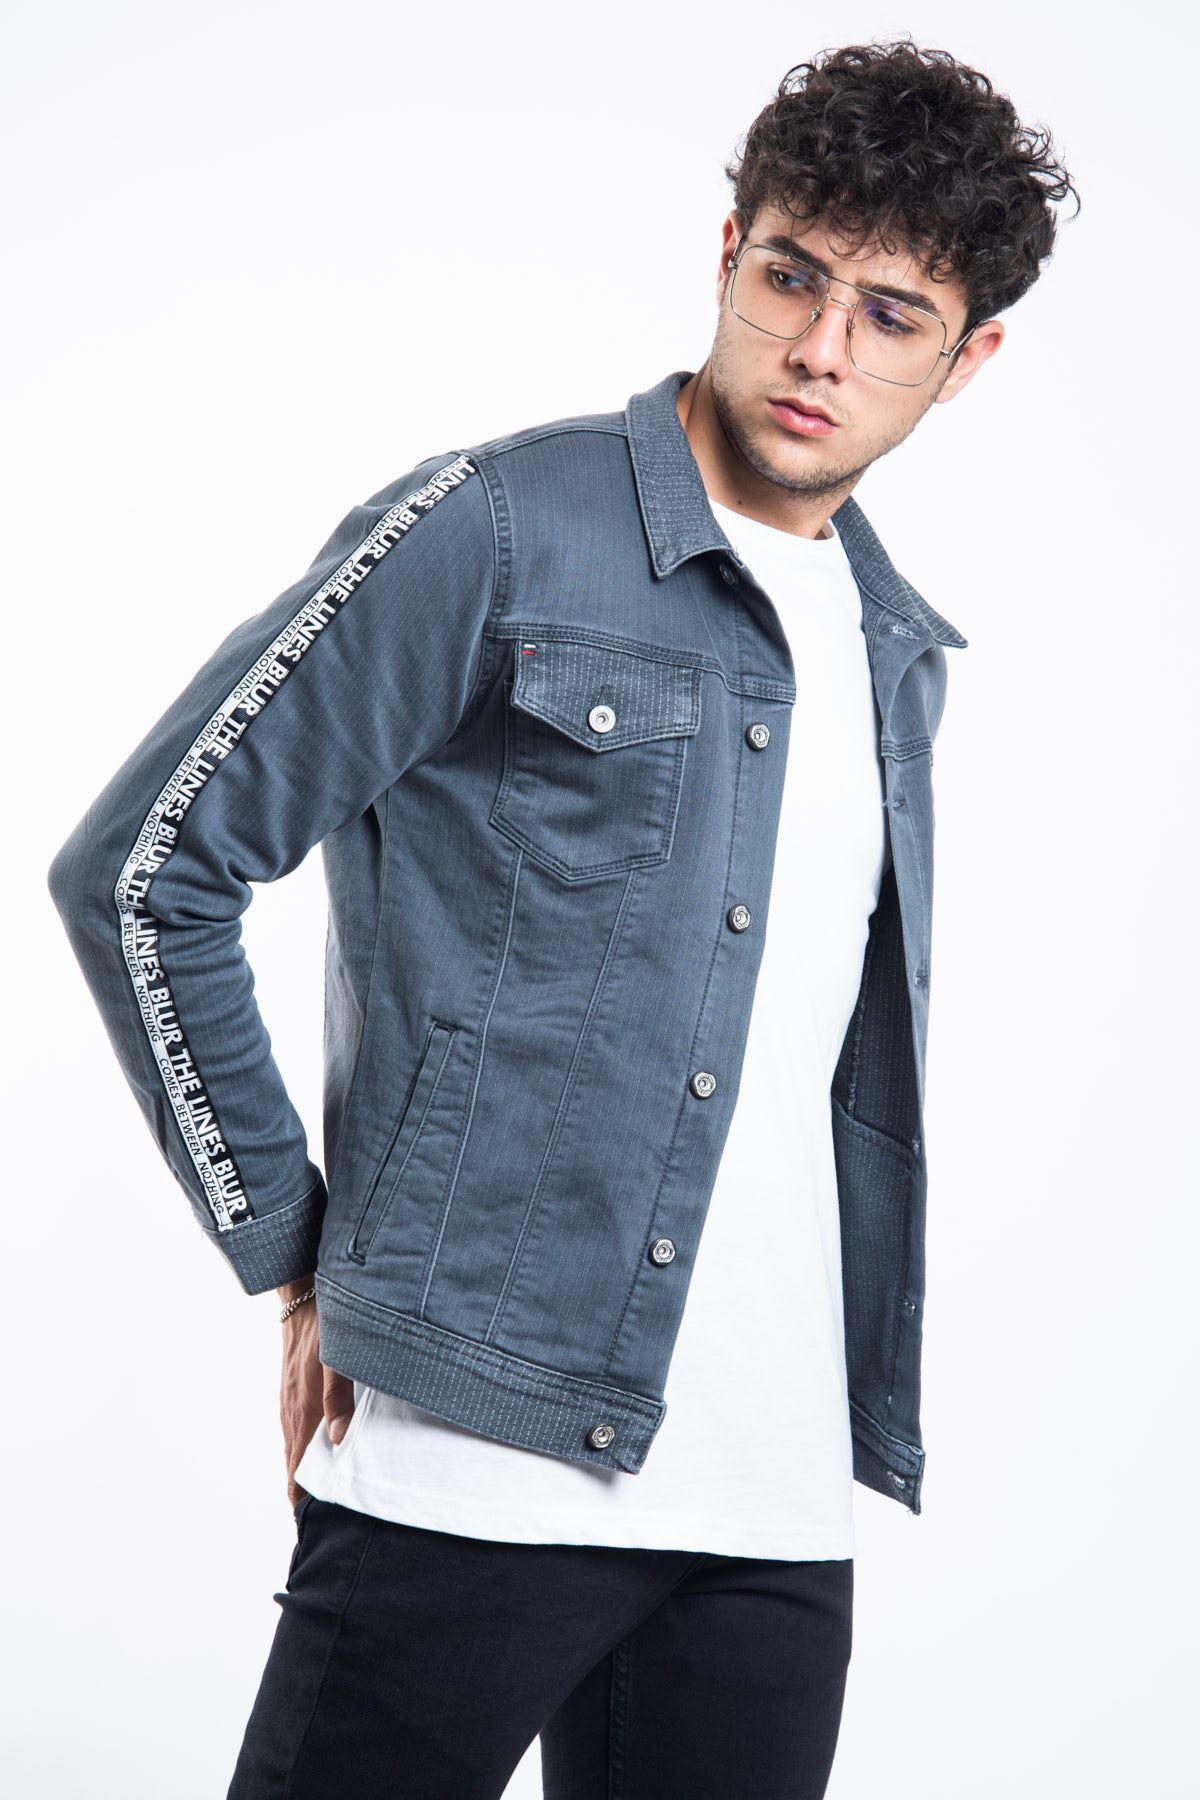 Kolu Şeritli Kumaş Detay Gri Erkek Kot Ceket